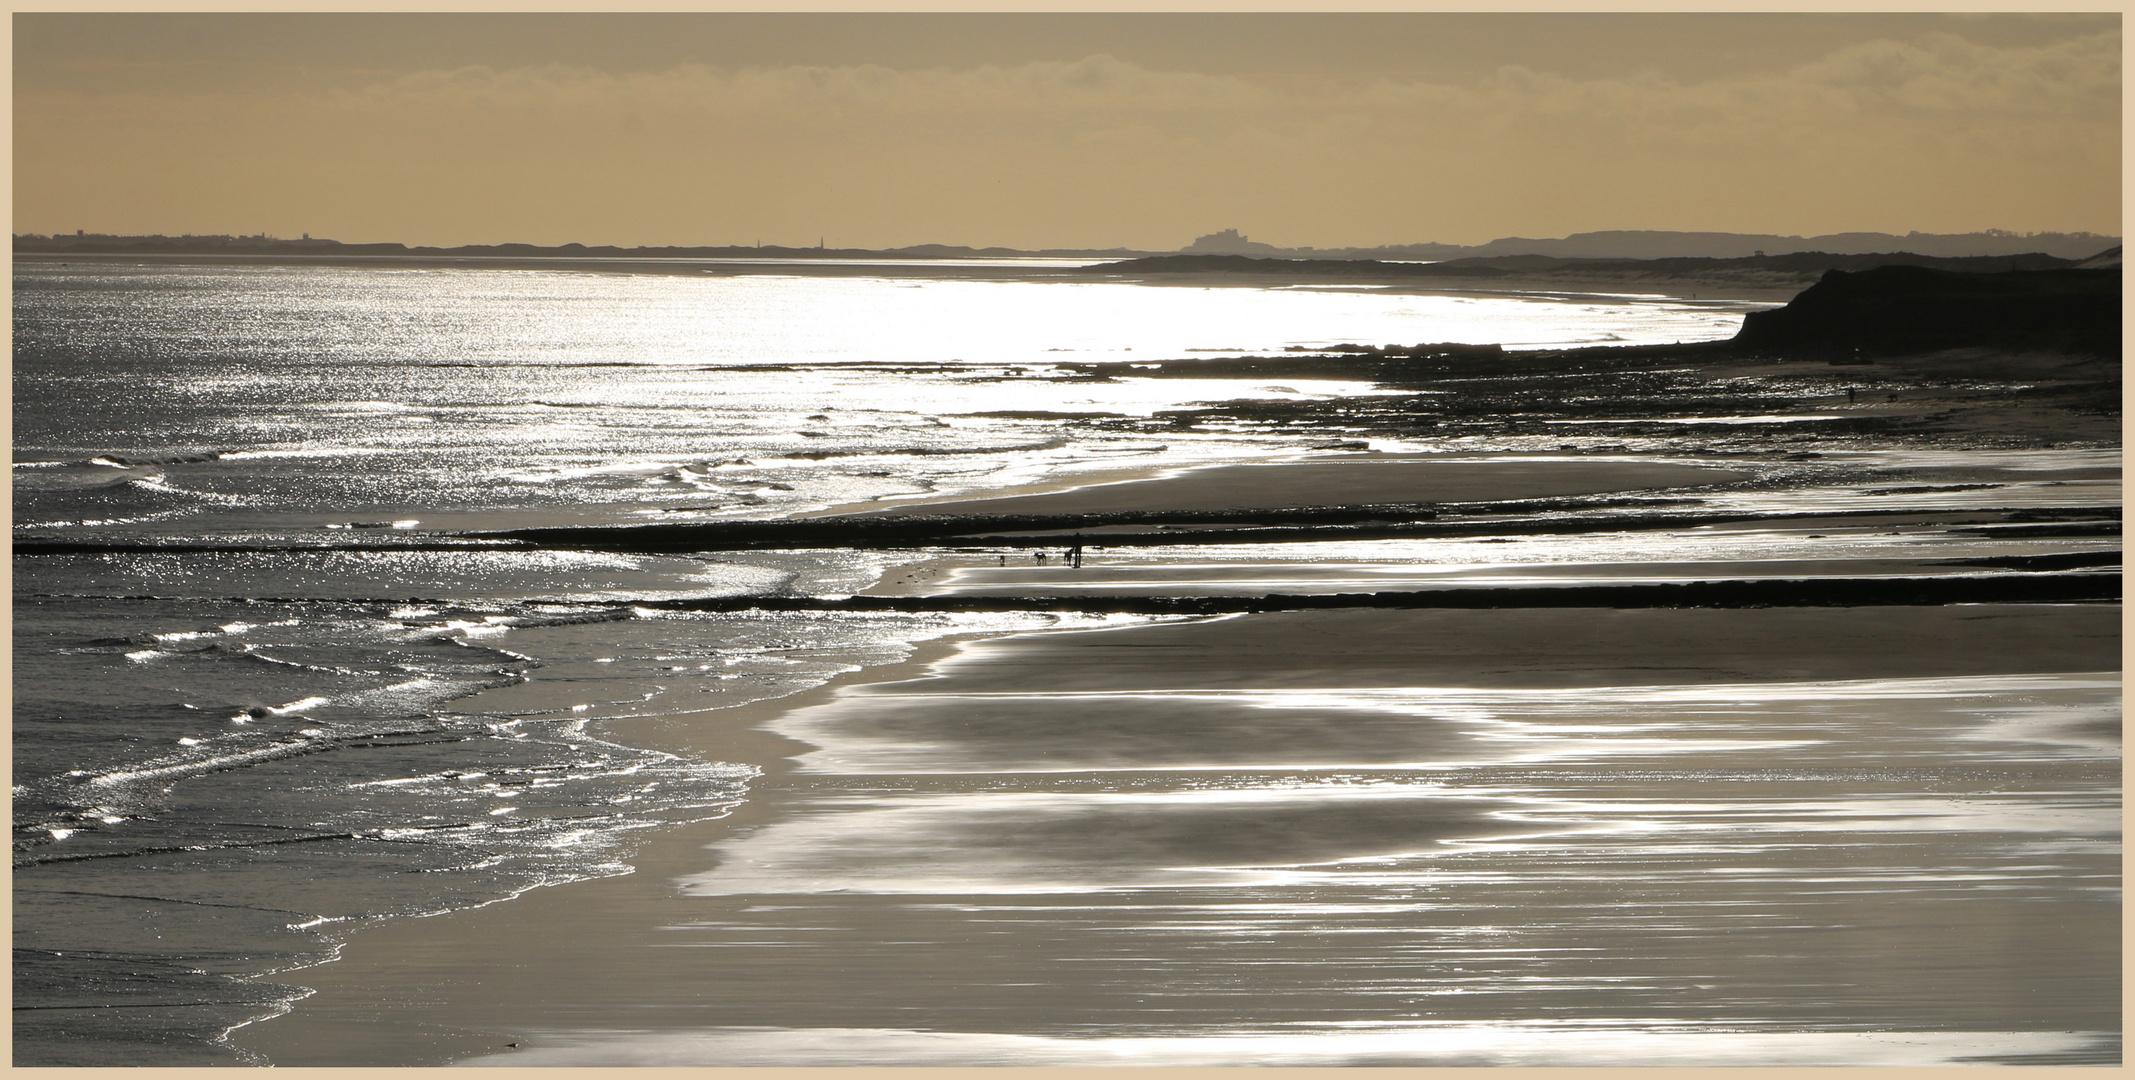 cocklawburn beach 1